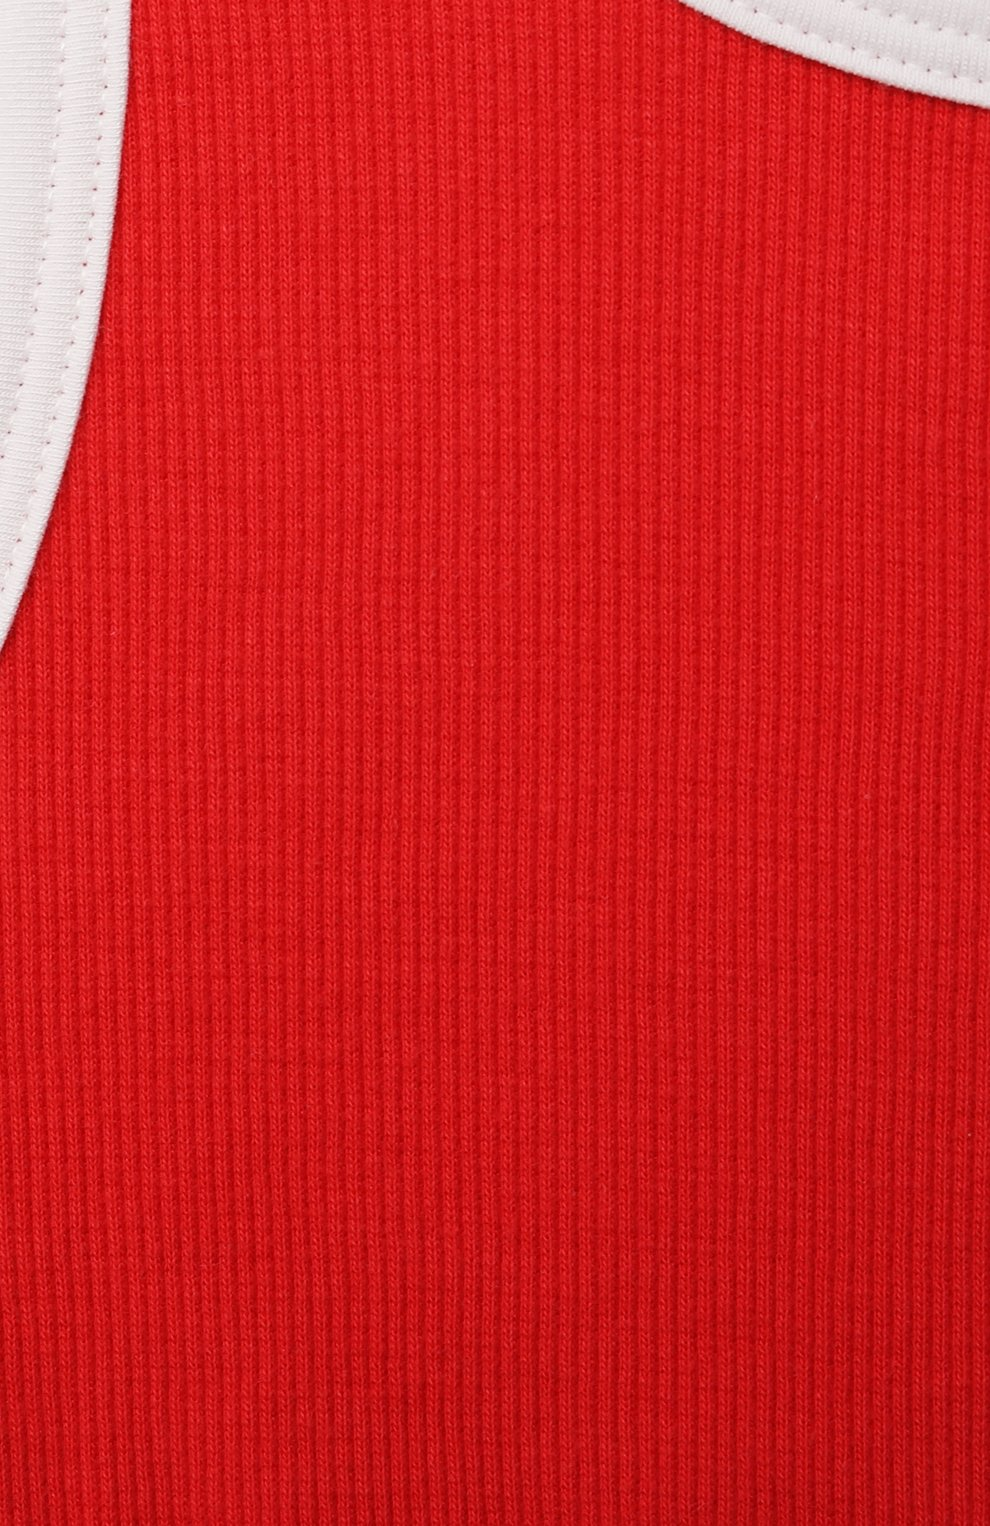 Детский бра-топ SANETTA красного цвета, арт. 346795 | Фото 3